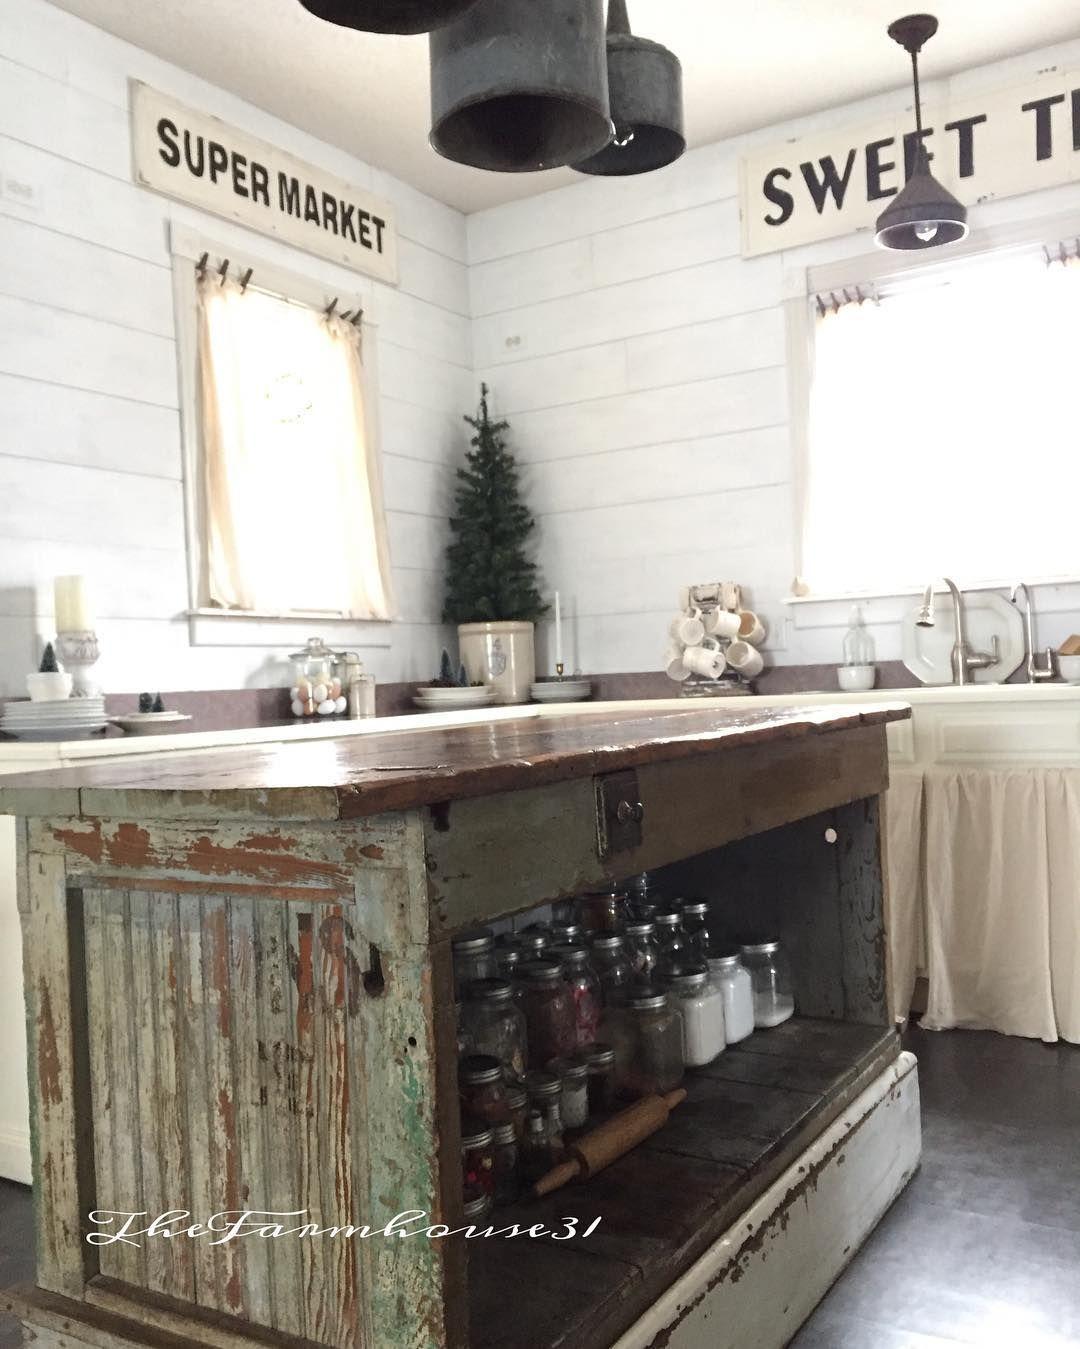 Pin By Veronica Ayala On Cozy Cottage Kitchens Rustic Kitchen Cabinets Farmhouse Kitchen Decor Vintage Farmhouse Kitchen